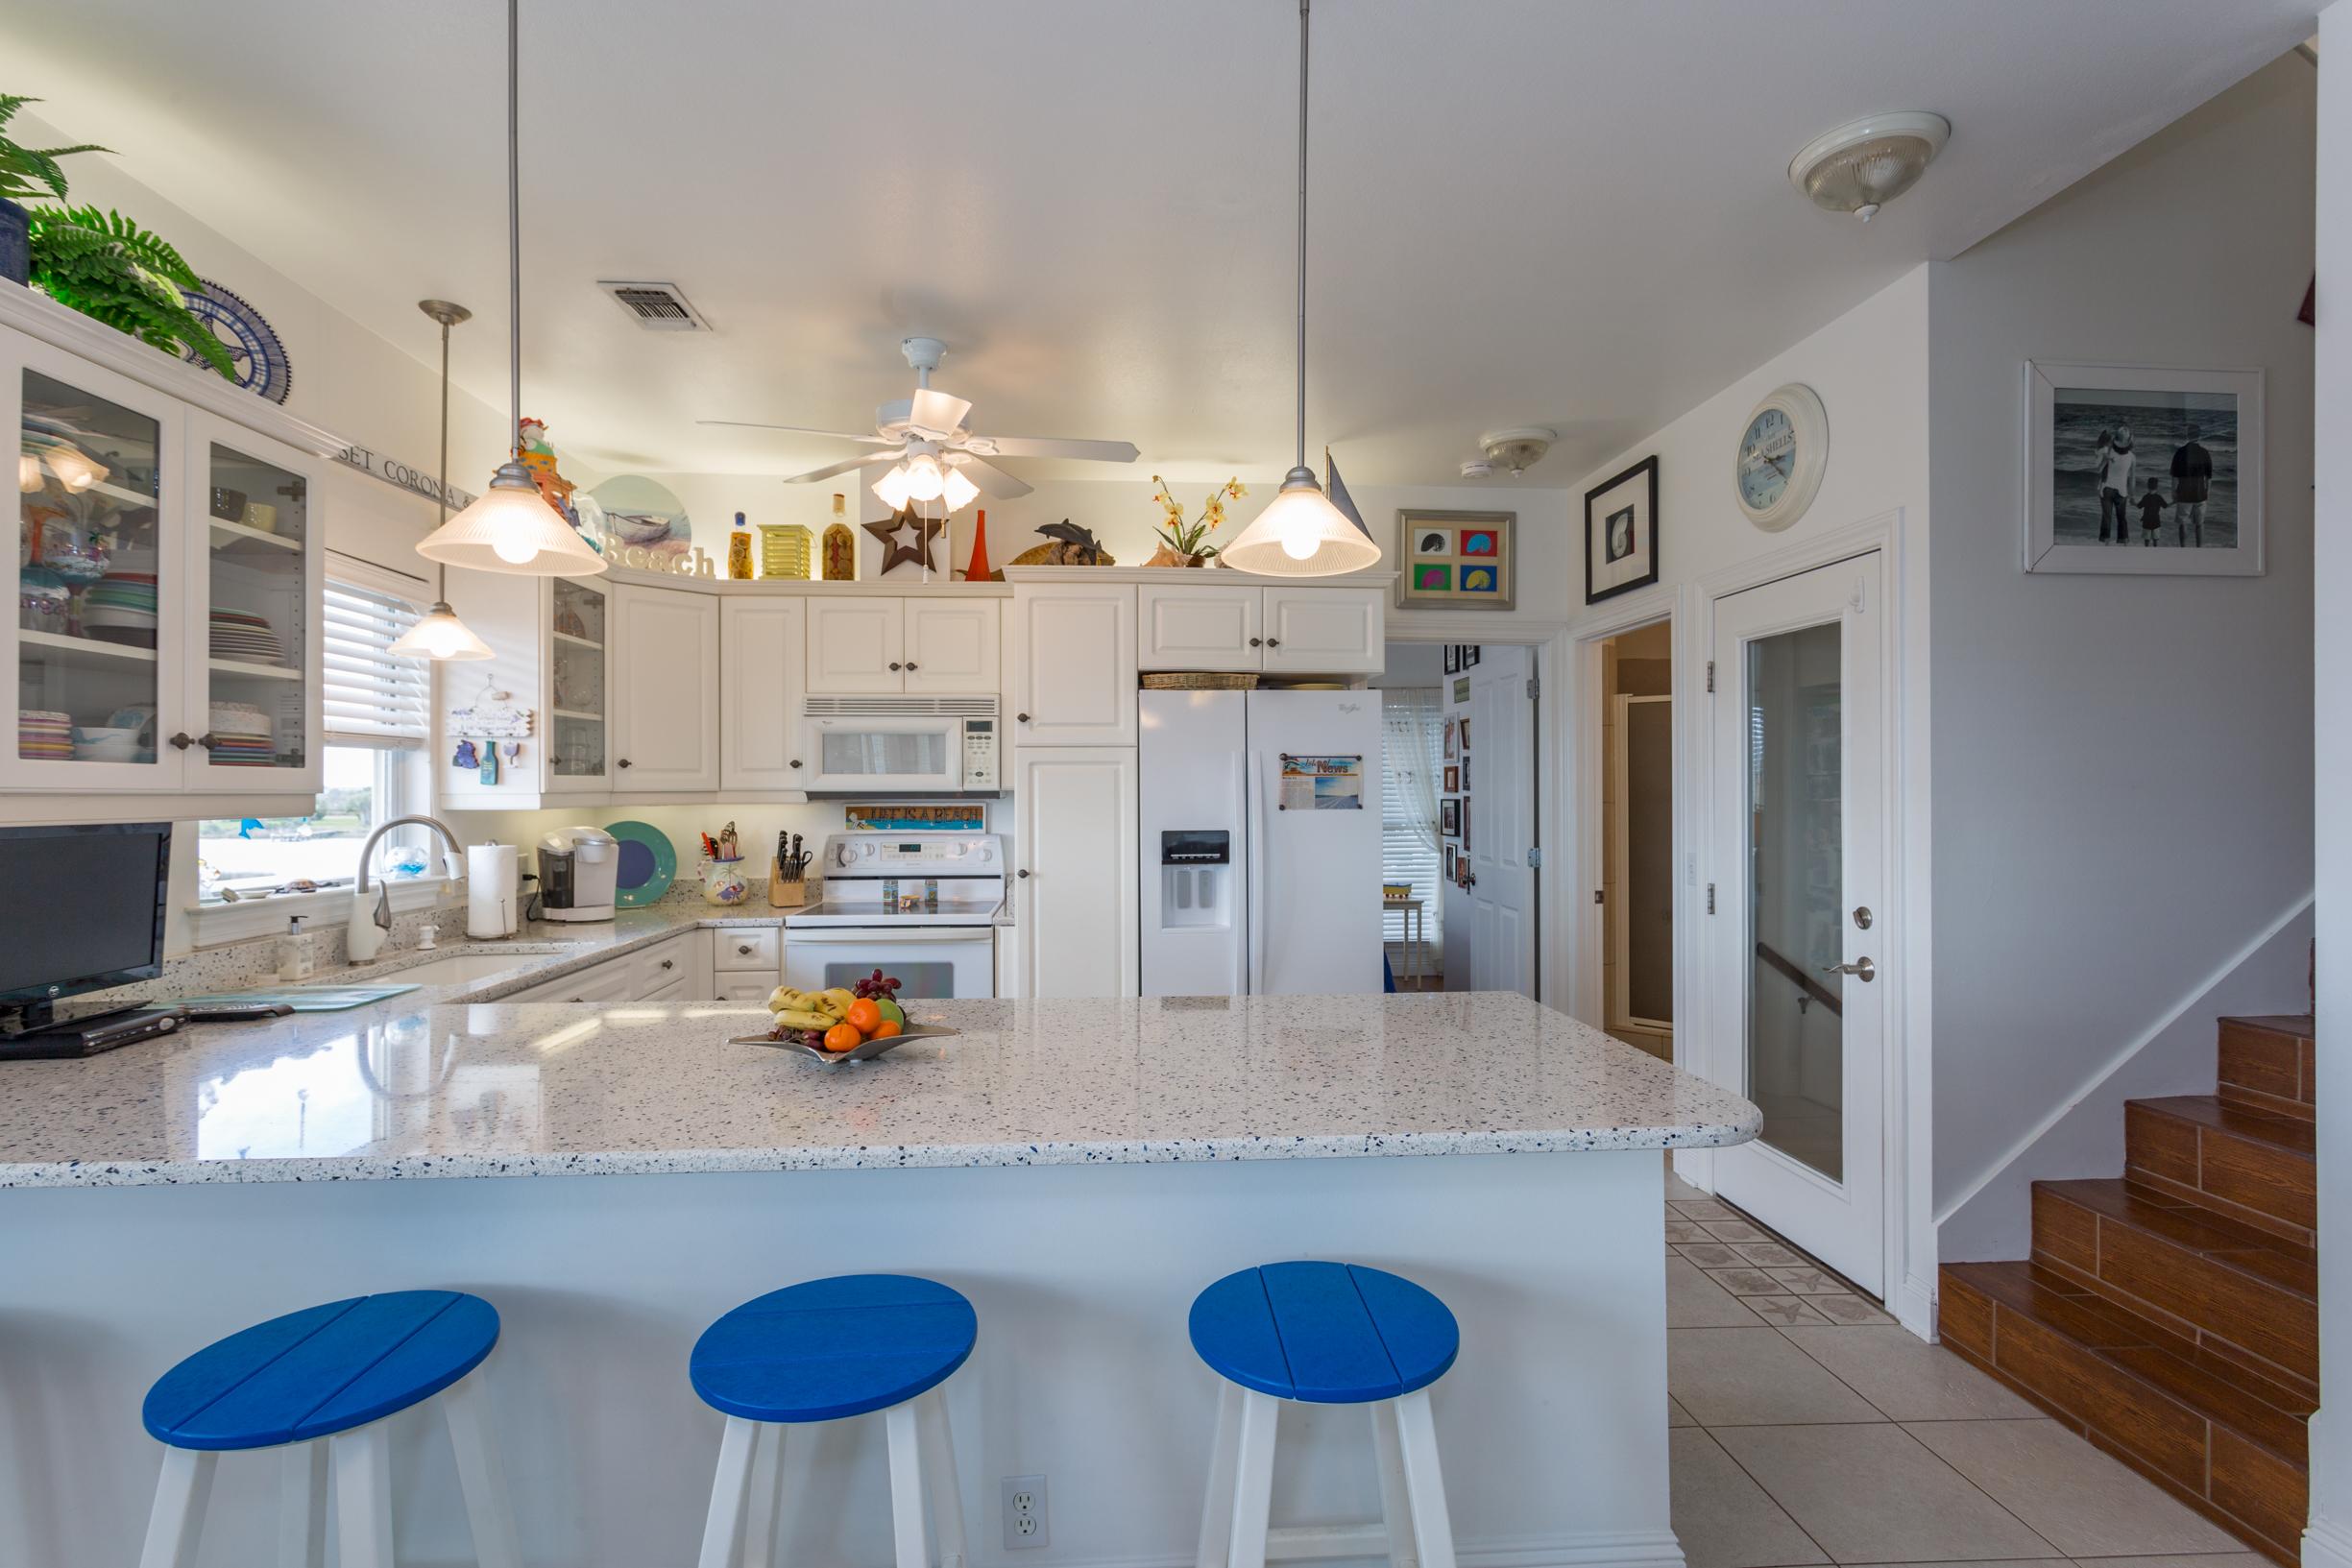 White Sands Cottage 501 Life's a Beach House Townhouse rental in White Sands Pensacola Beach in Pensacola Beach Florida - #8